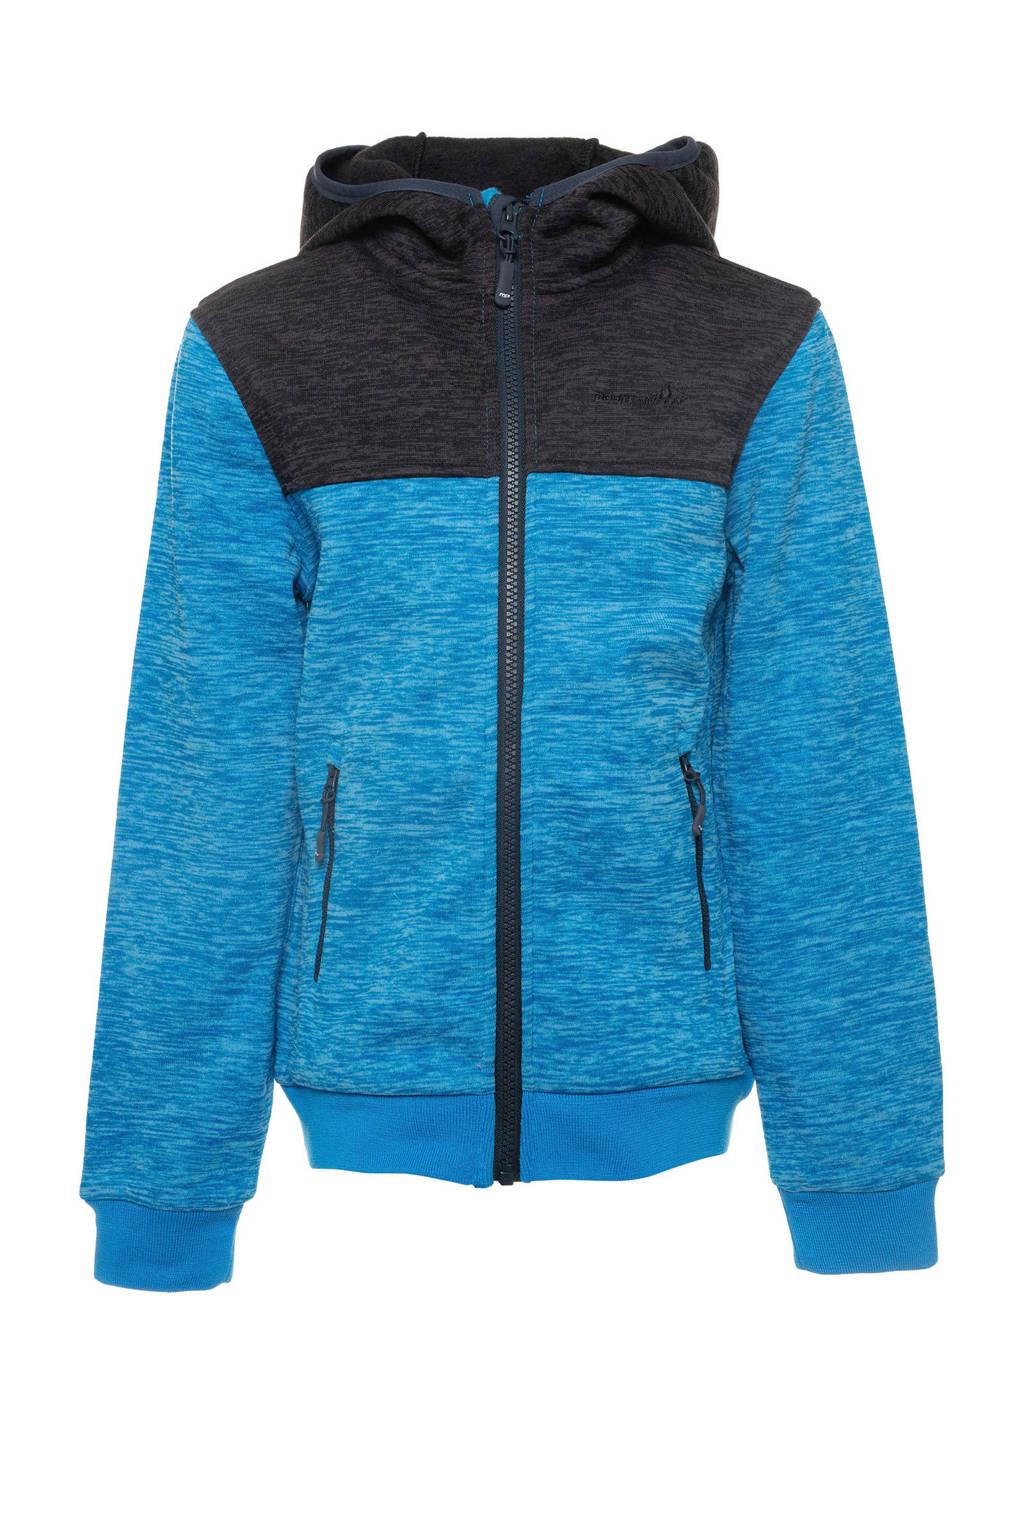 Scapino Mountain Peak outdoor vest blauw/antraciet, Blauw/antraciet